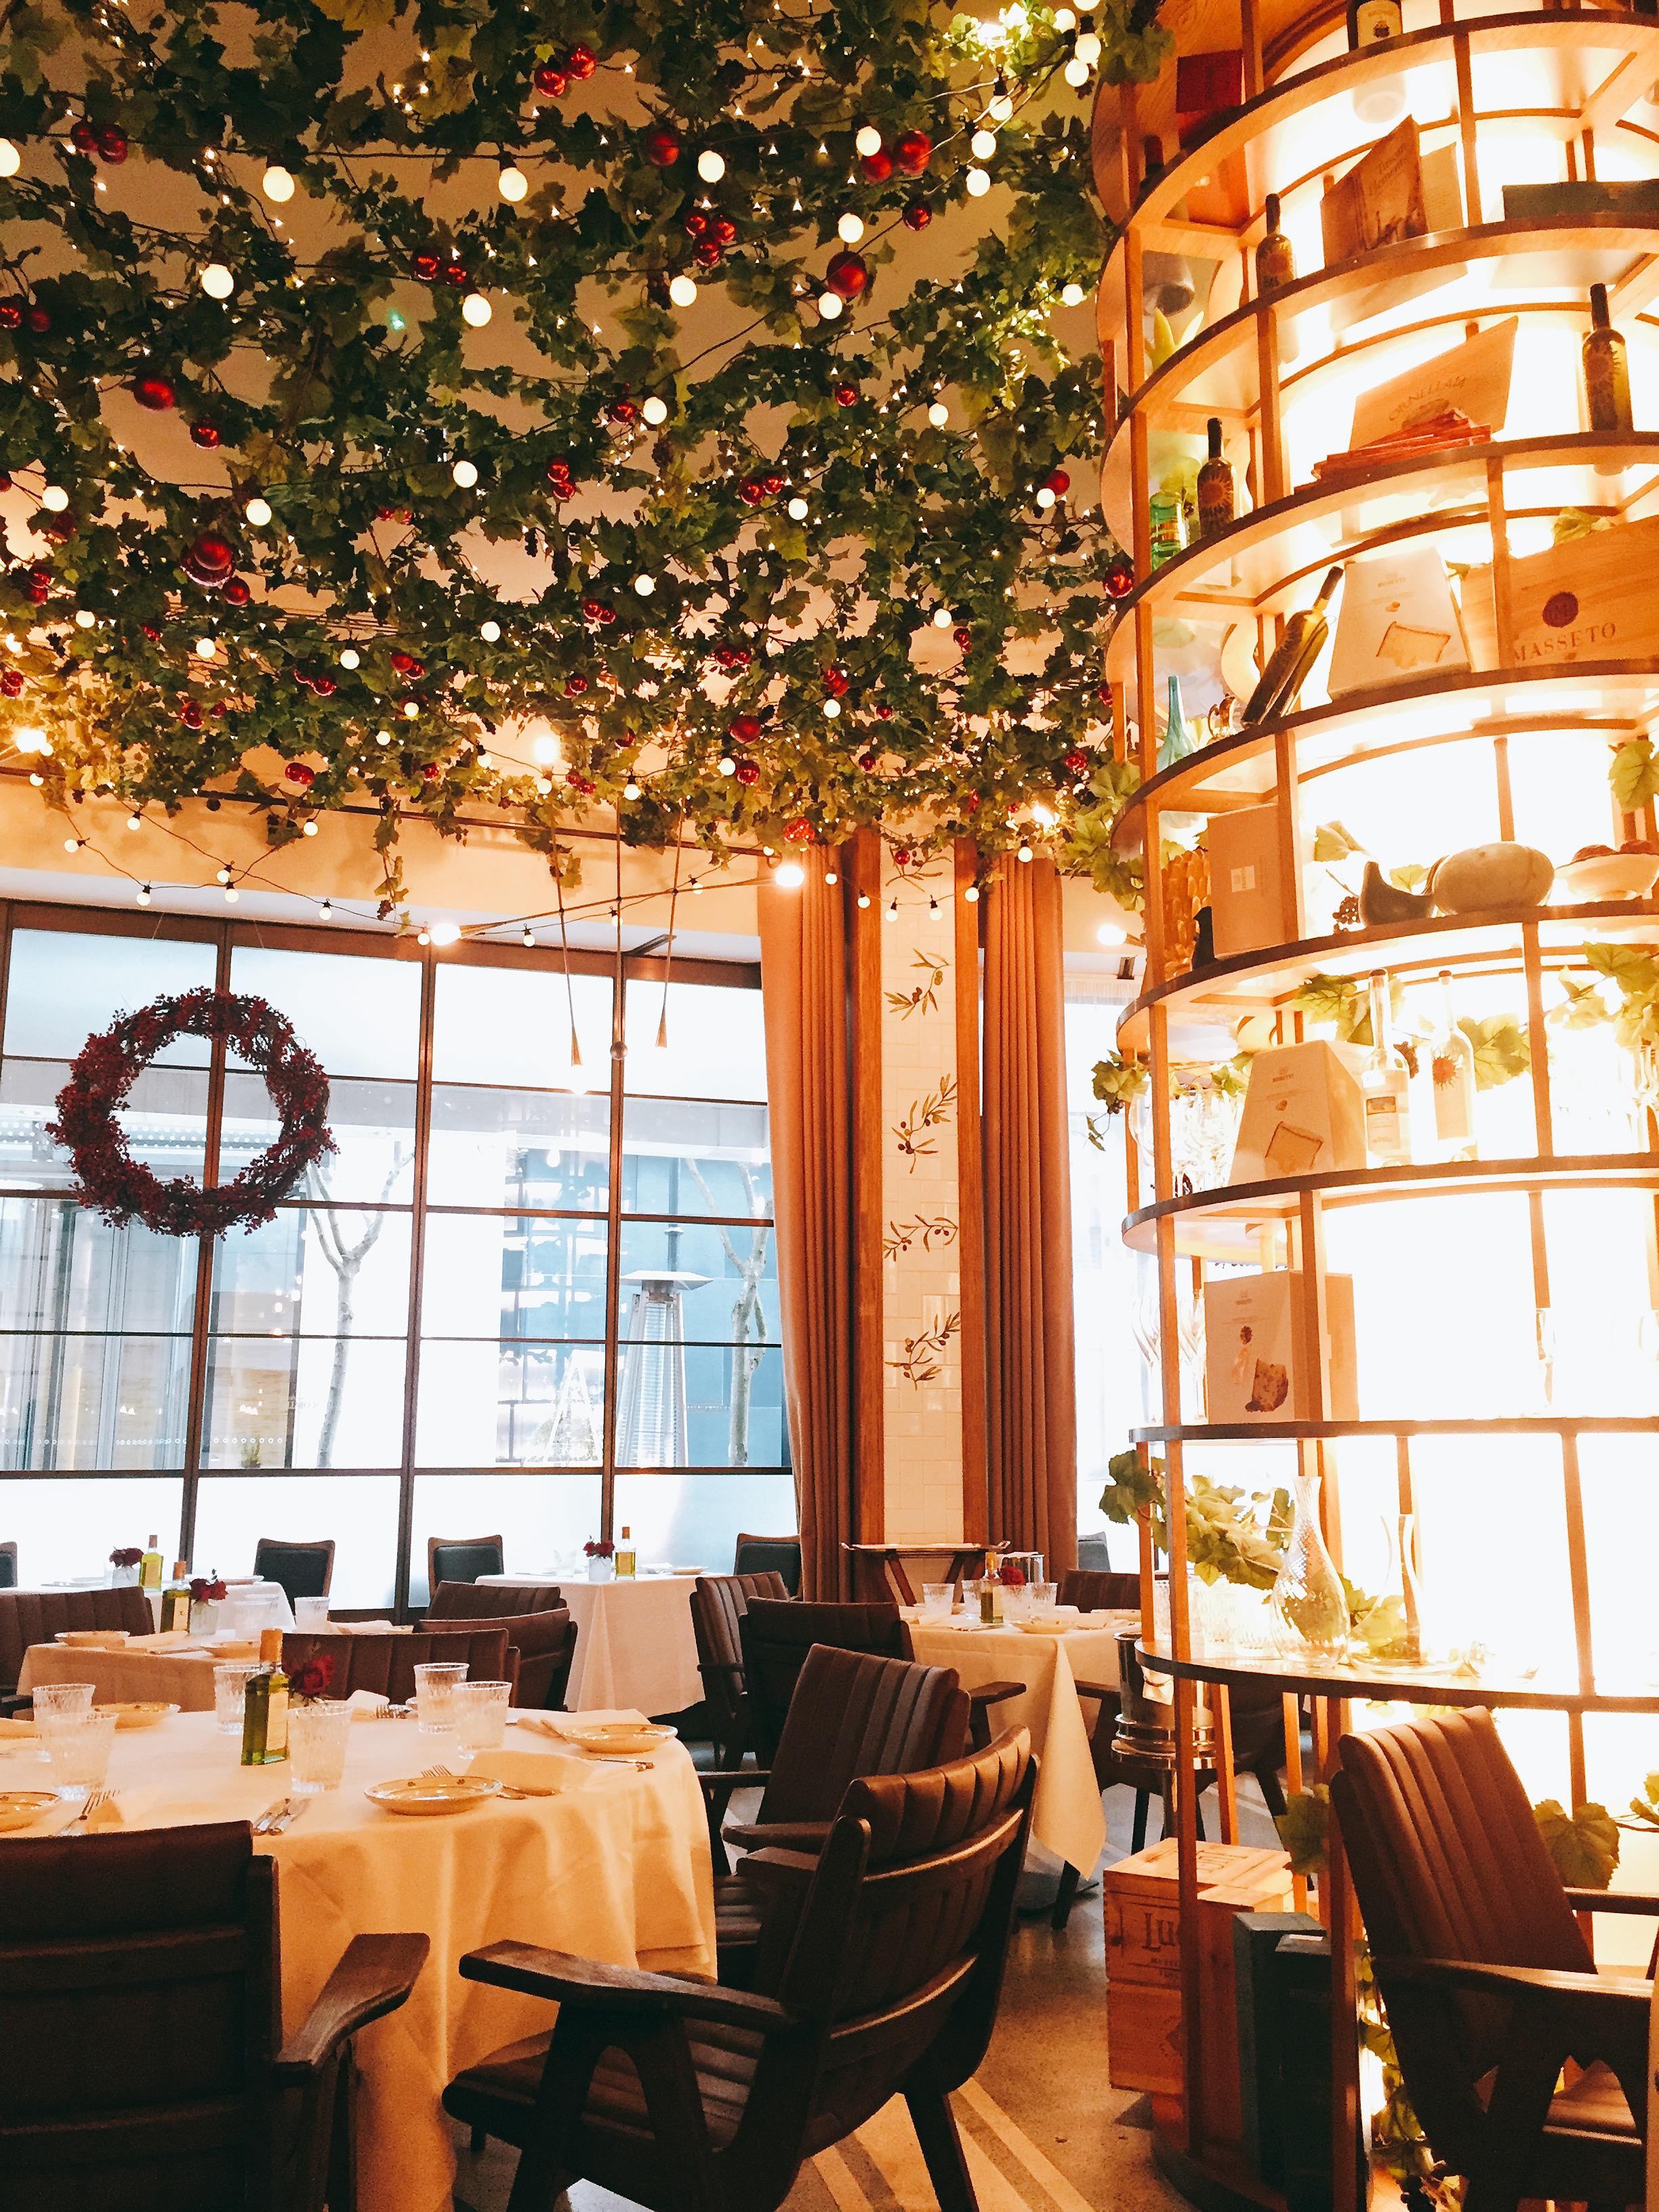 Frescobaldi restaurant review